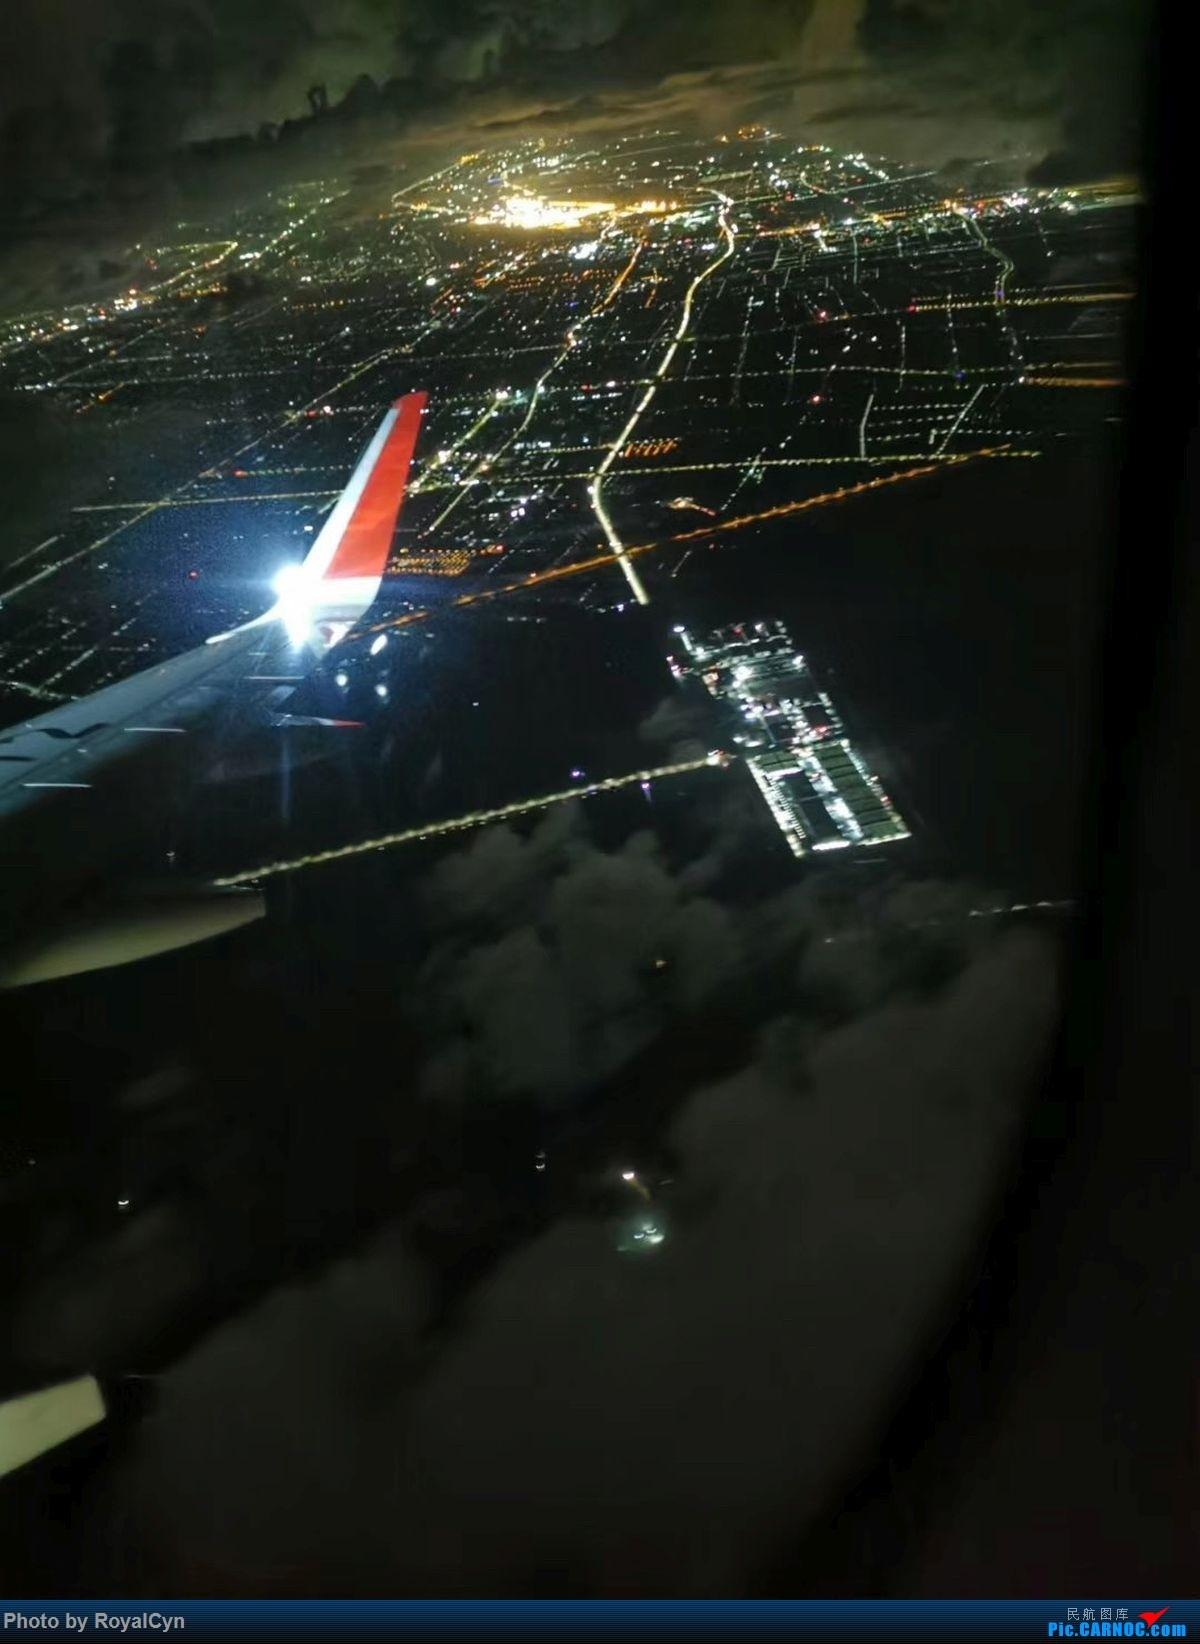 Re:[原创]Royal游记No.3【佛塔国度狂想曲——棉麻国缅甸】三城6日游 AIRBUS A320-200 B-8372 缅甸仰光机场